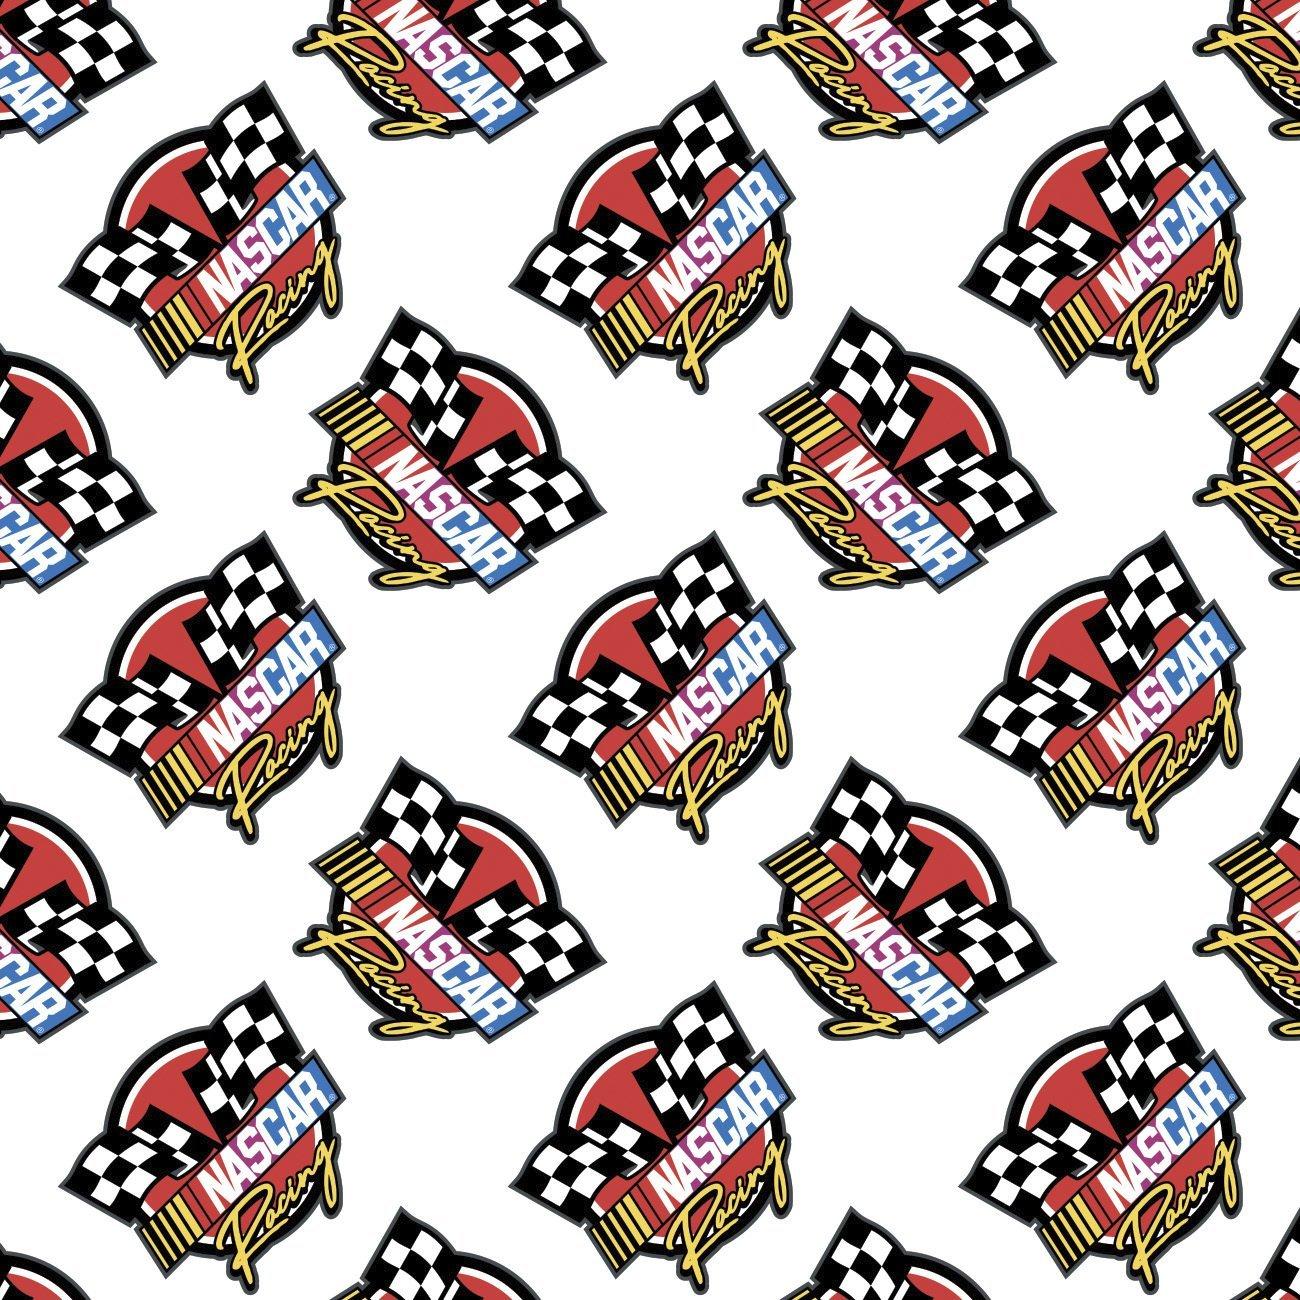 Nascar 39190106-1 White Retro Racing